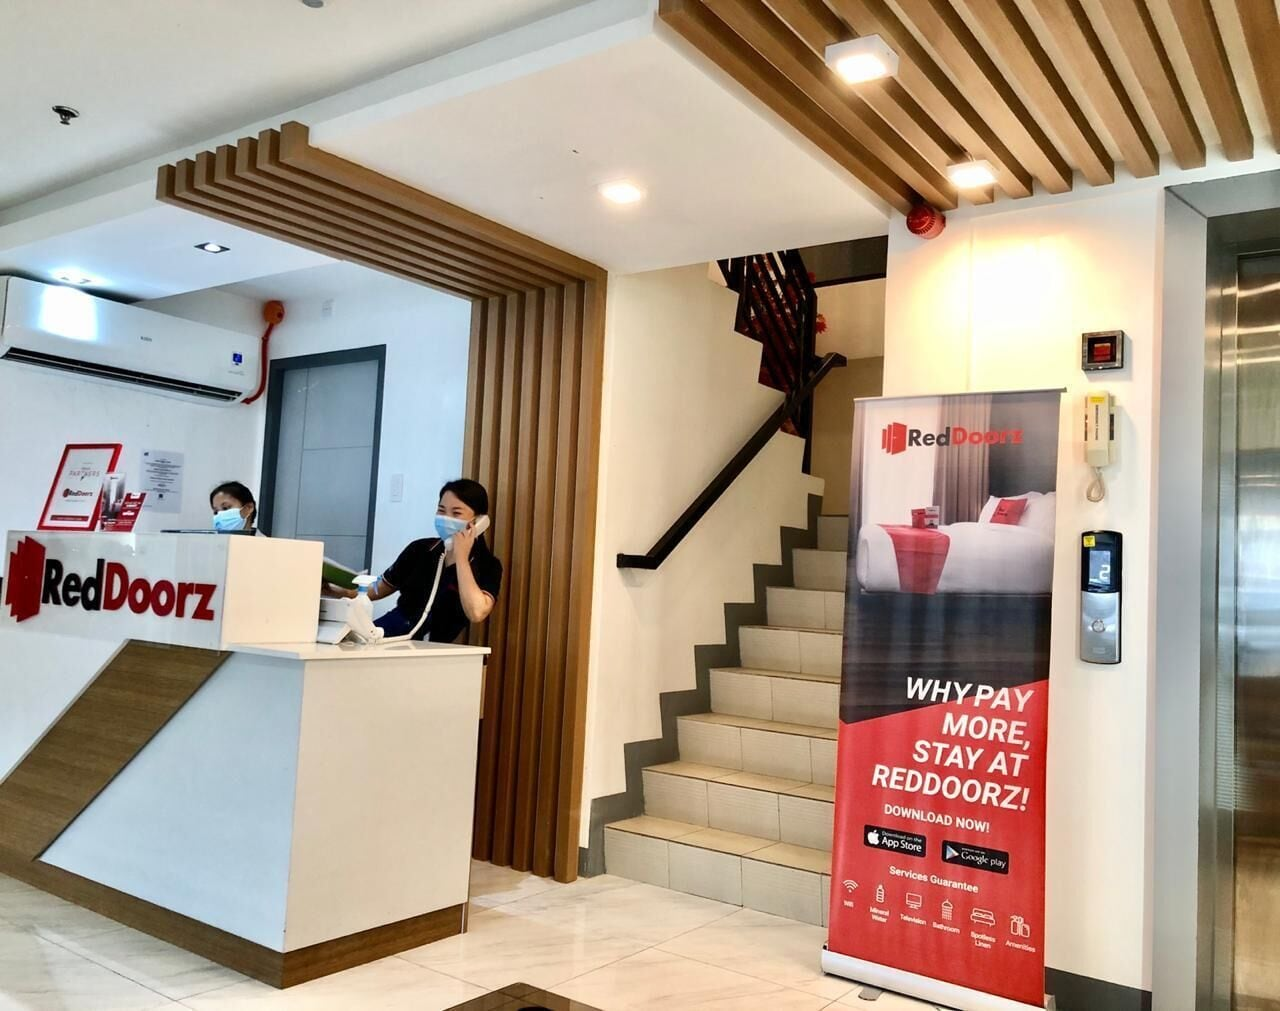 RedDoorz Plus @ Jardin Suites Guadalupe Nuevo, Makati City